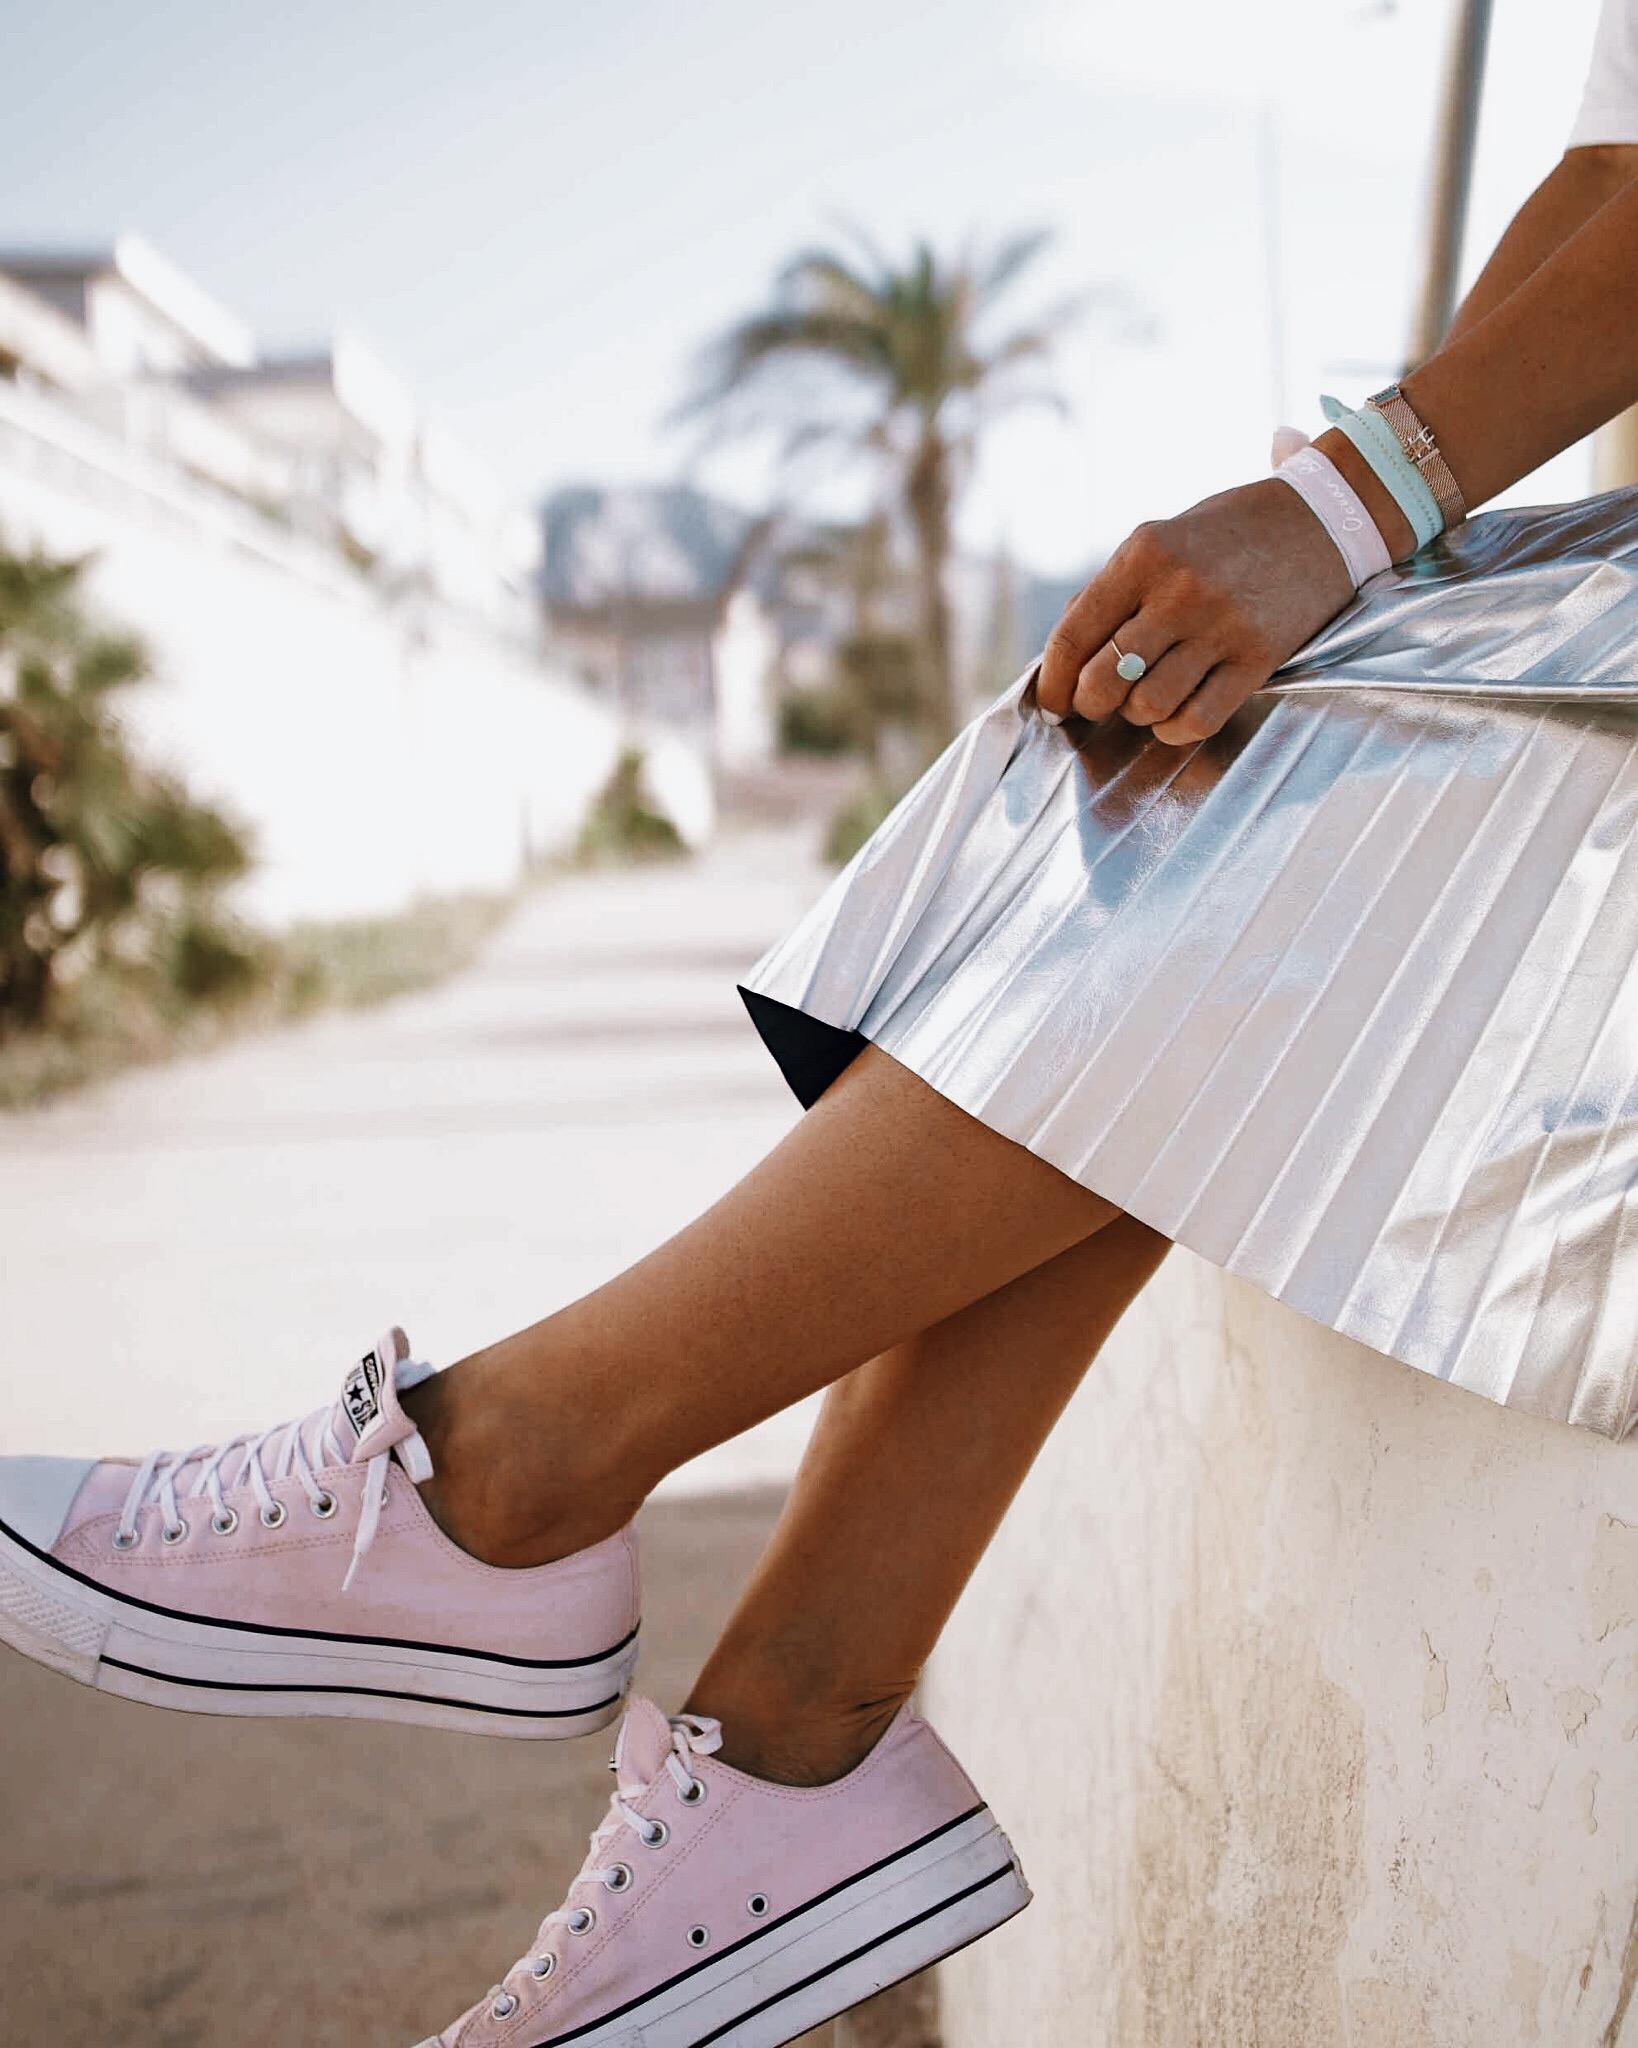 how to style silver midi skirt, jupe plissée argentée, jupe mi-longue métallisée, midi skirt, folded silver skirt